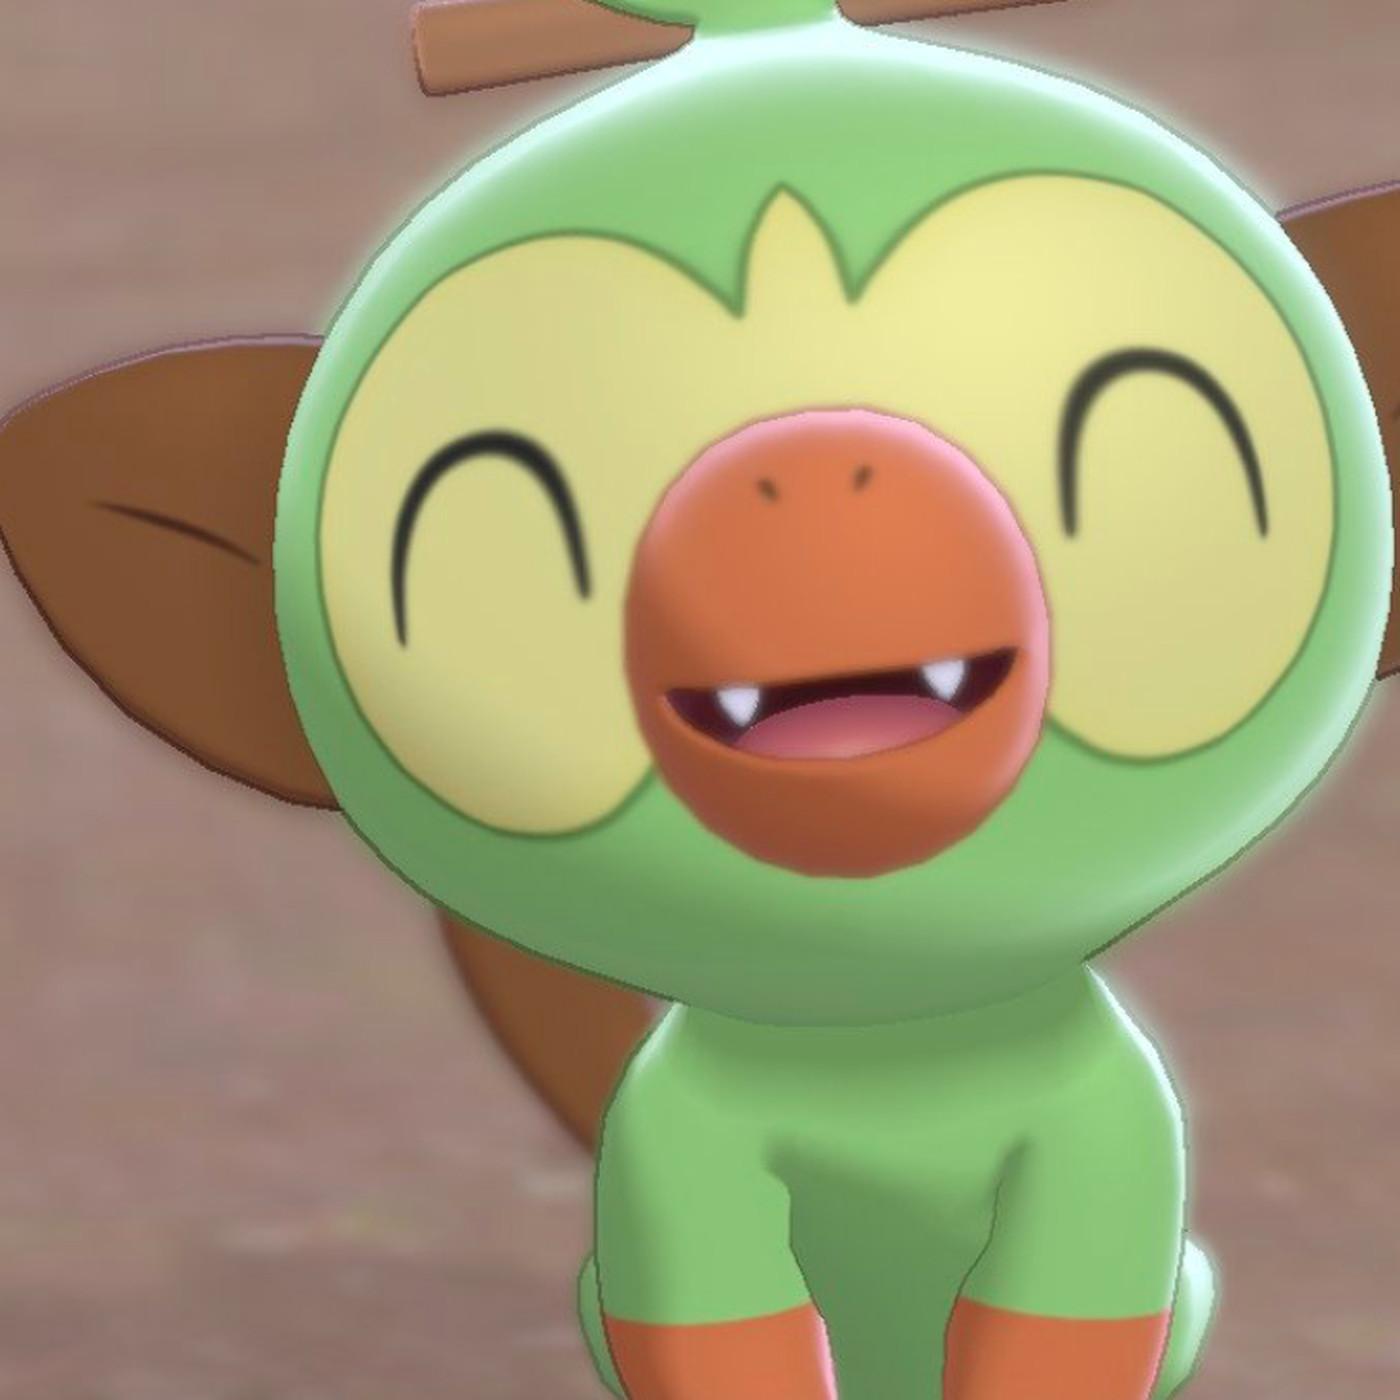 Despite blowback, Pokémon Sword and Shield's animations are